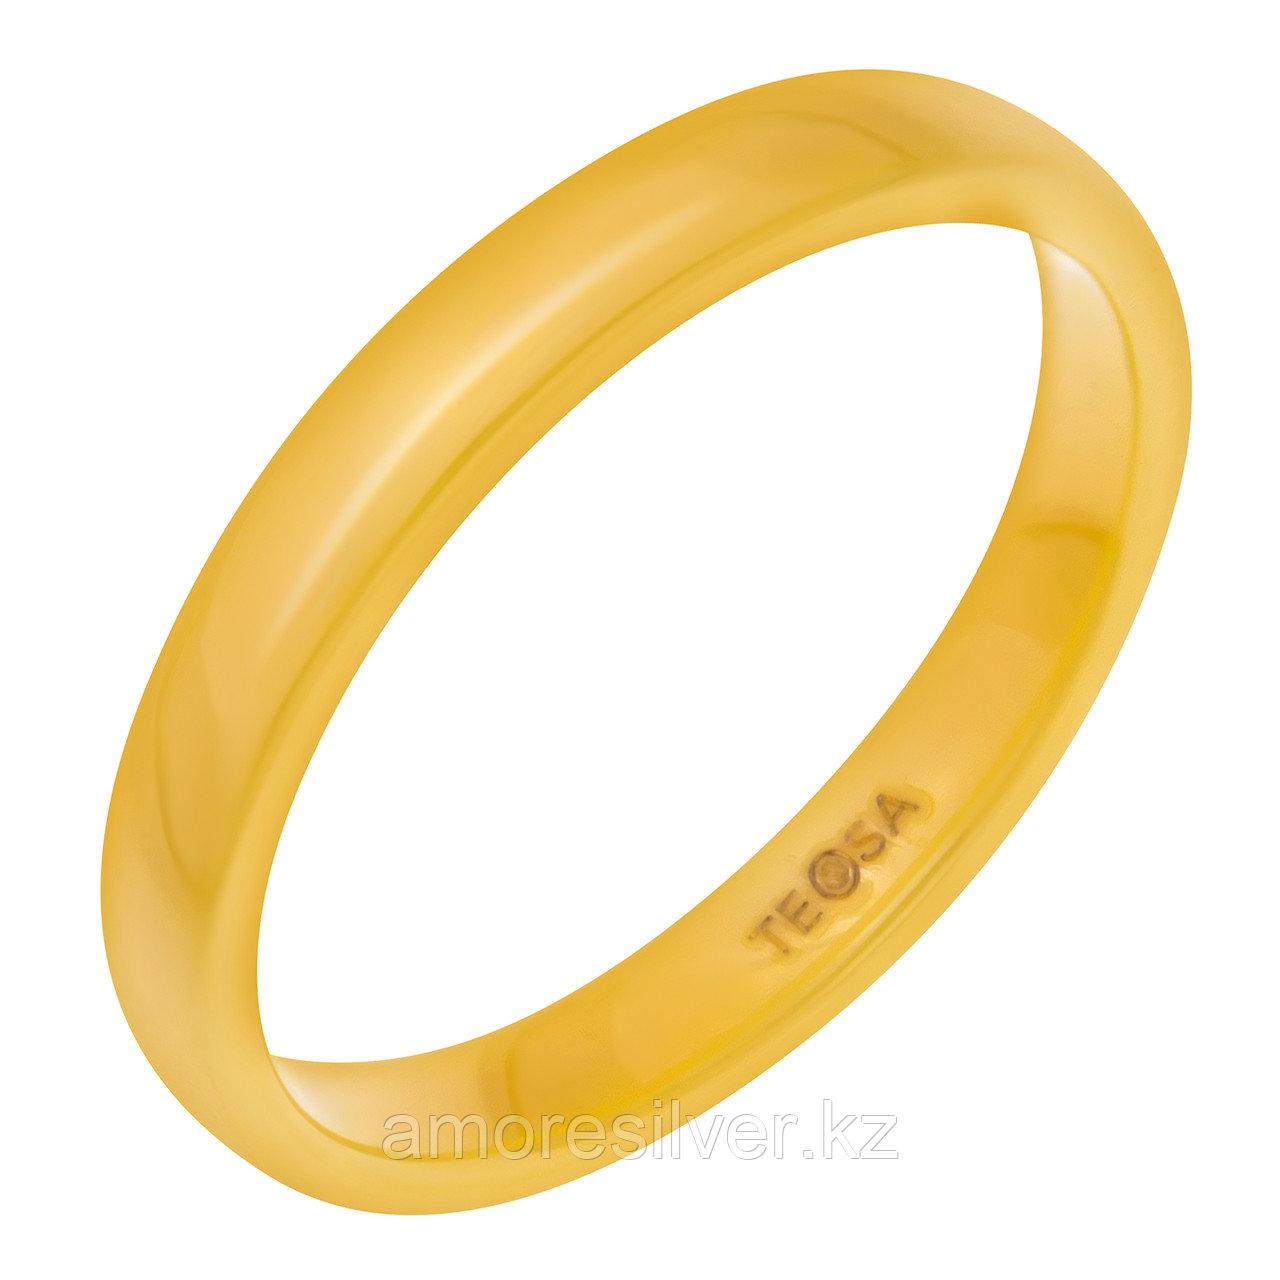 Кольцо Teosa серебро без покрытия, керамика,  ZCP-097-Y размеры - 16,5 17 17,5 18 18,5